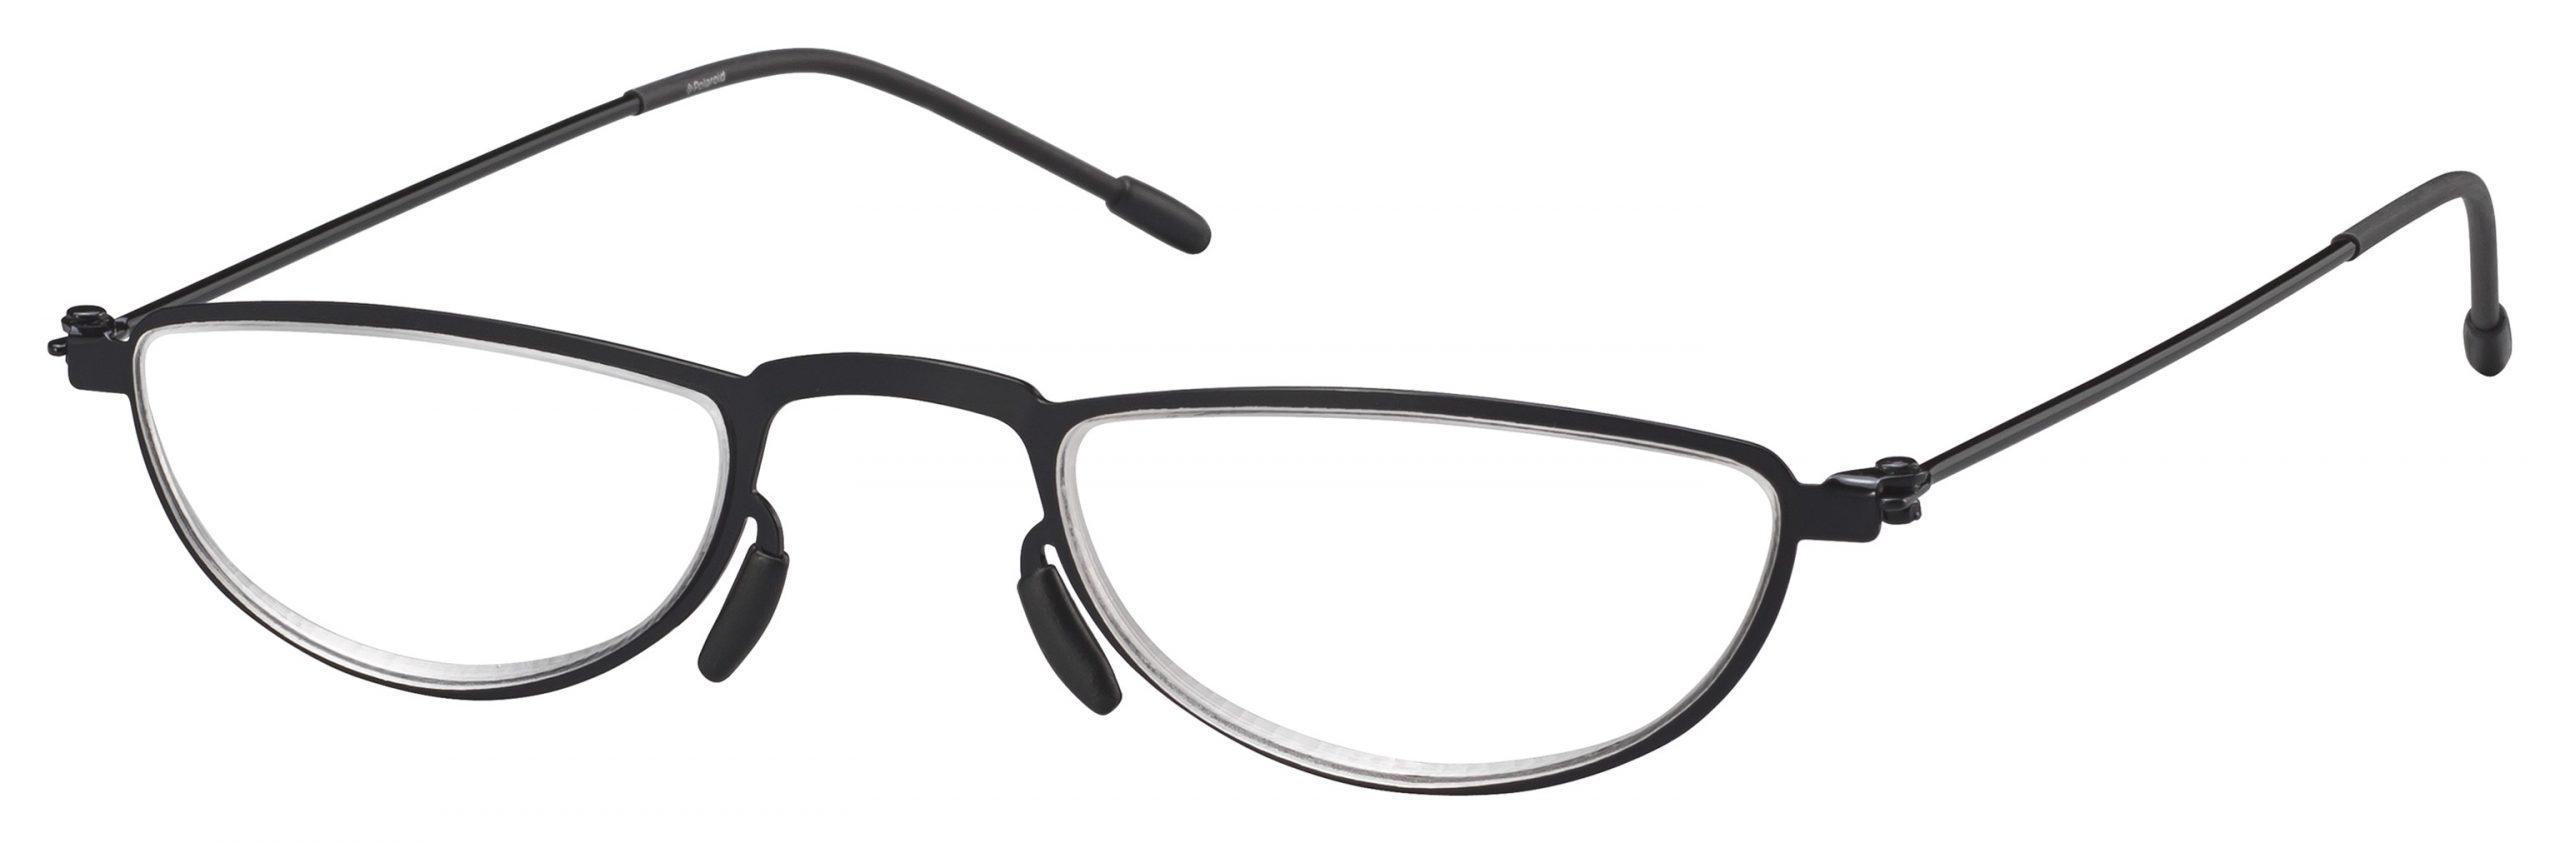 Leesbril Polaroid PLD0006 zwart